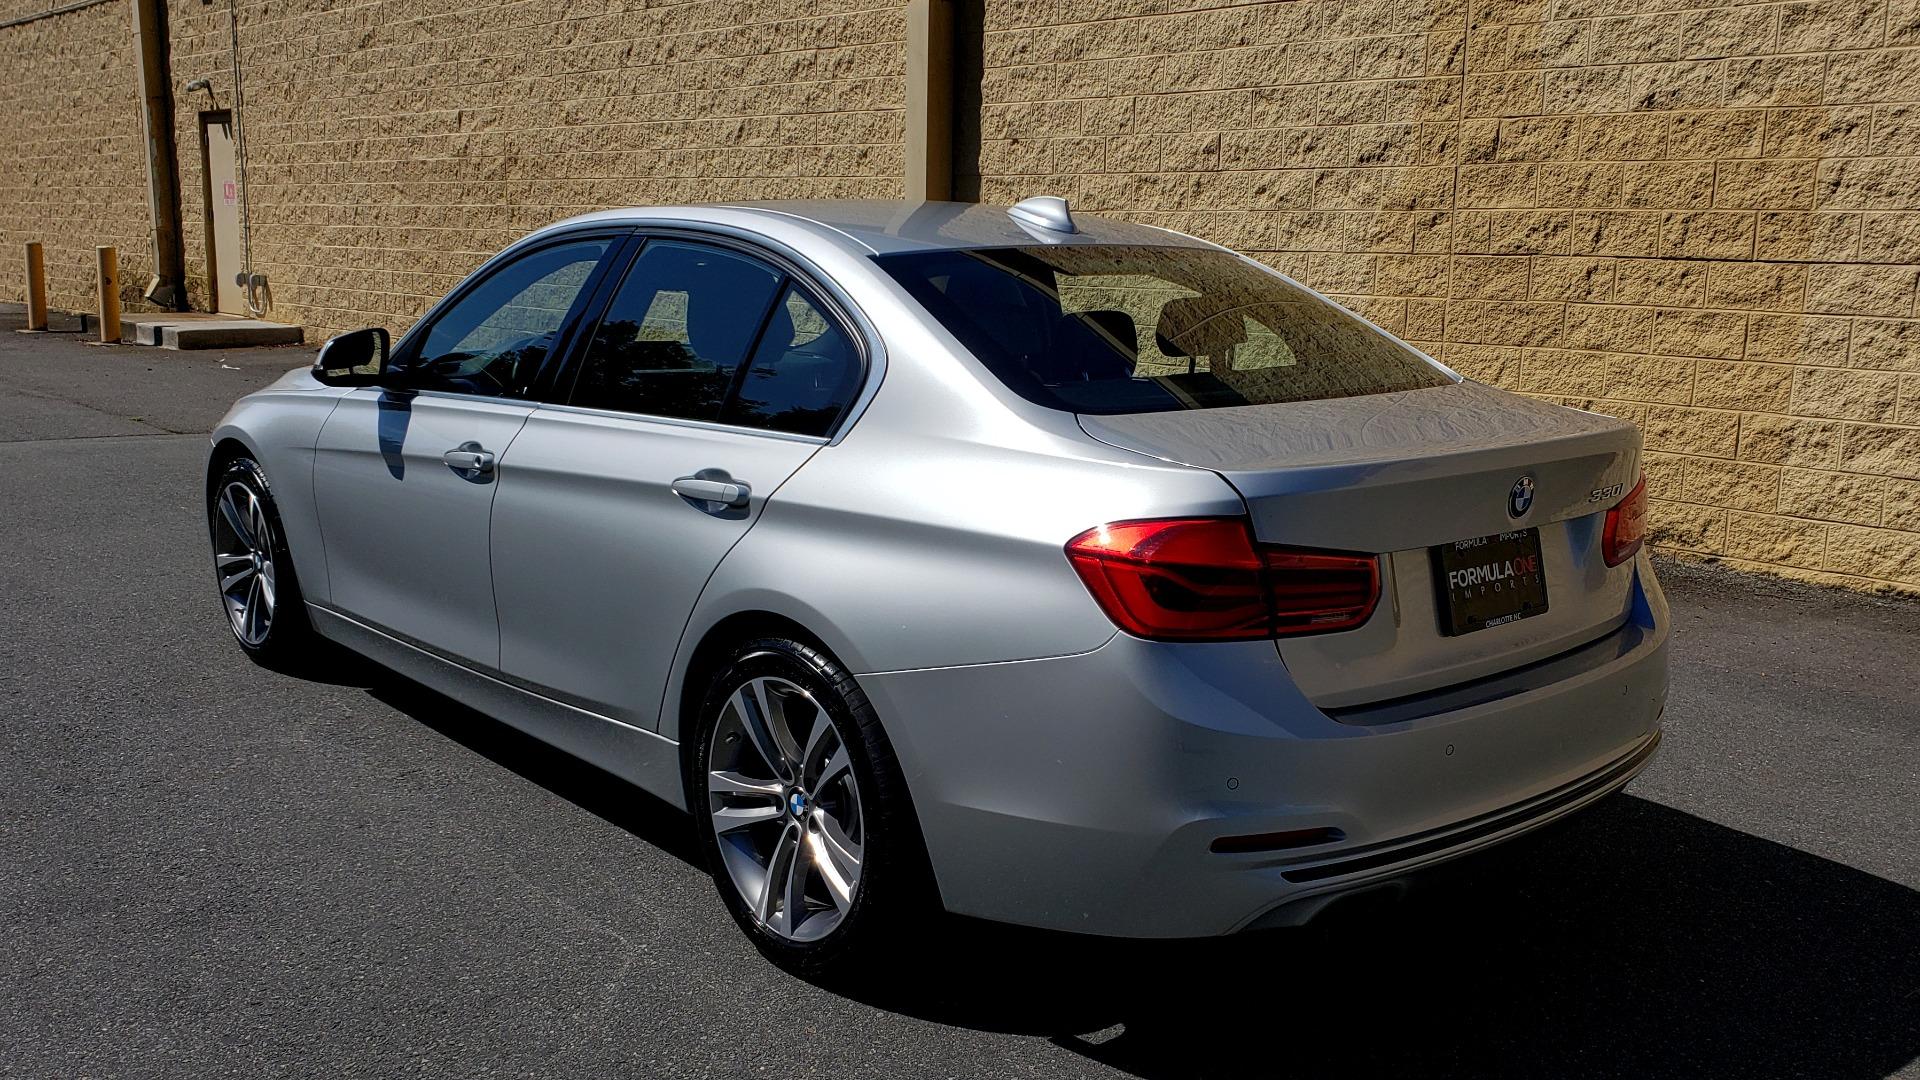 Used 2017 BMW 3 SERIES 330I SPORT SEDAN / DRVR ASST PKG / SUNROOF / REARVIEW for sale Sold at Formula Imports in Charlotte NC 28227 3